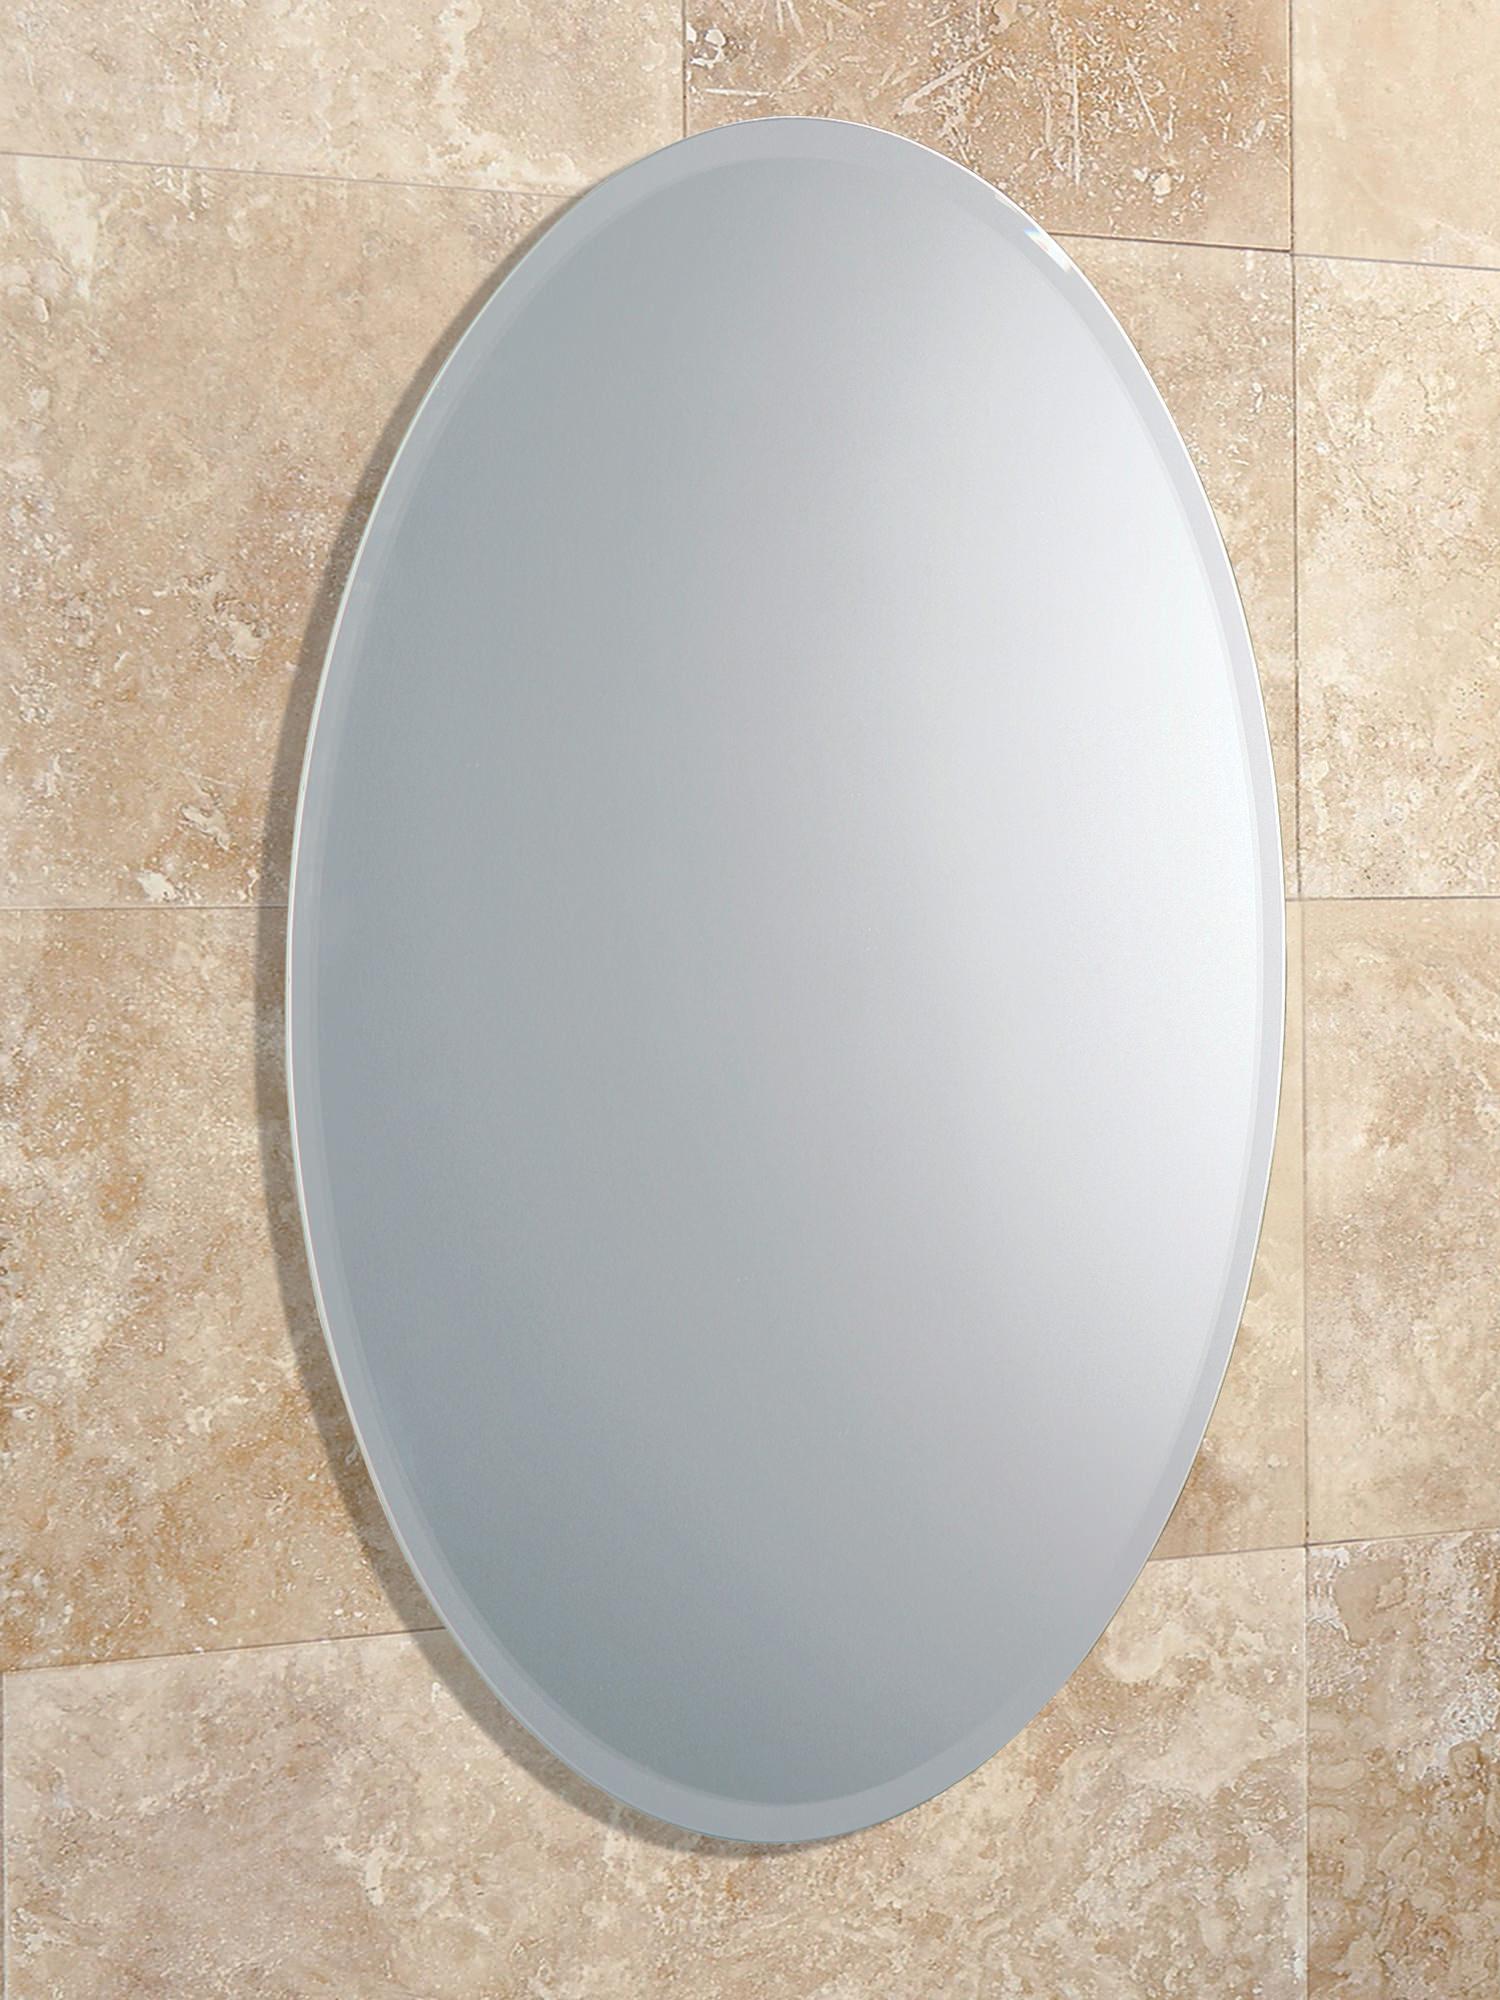 HIB Alfera Oval Shaped Mirror With Bevelled Edge